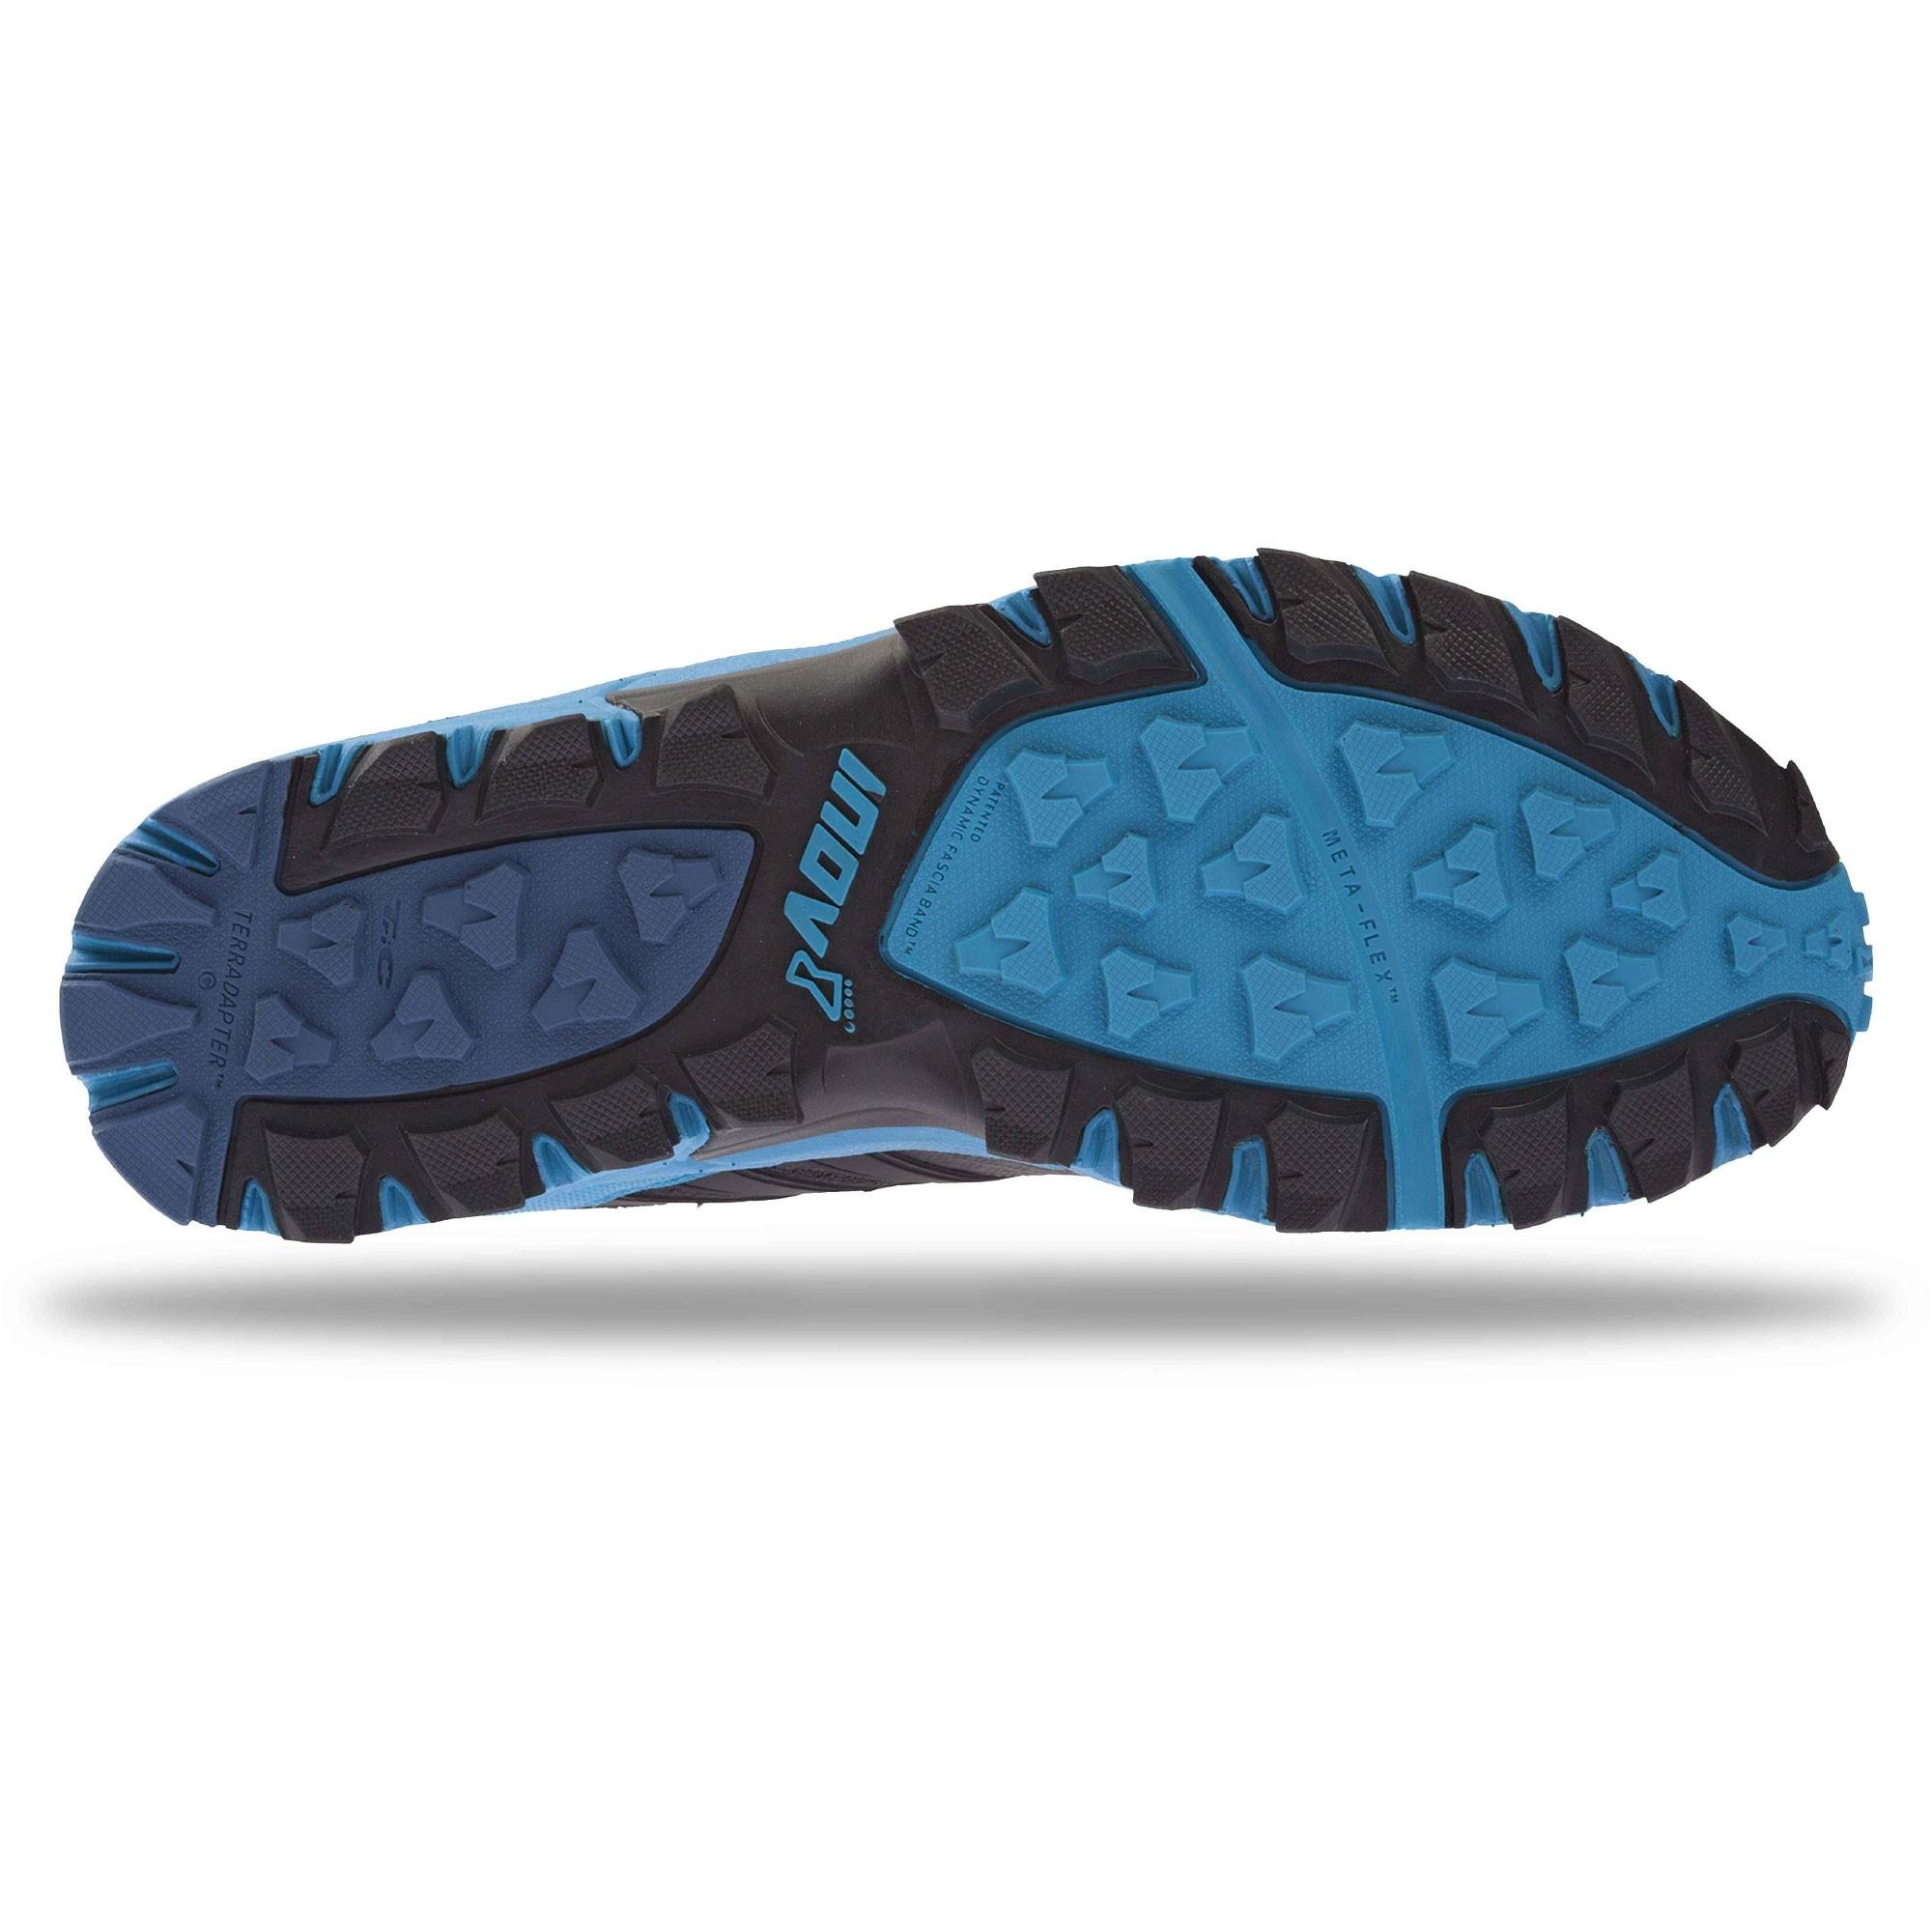 Inov8 Trail Talon 290 Trail Running Shoes - Black/Blue - Sole